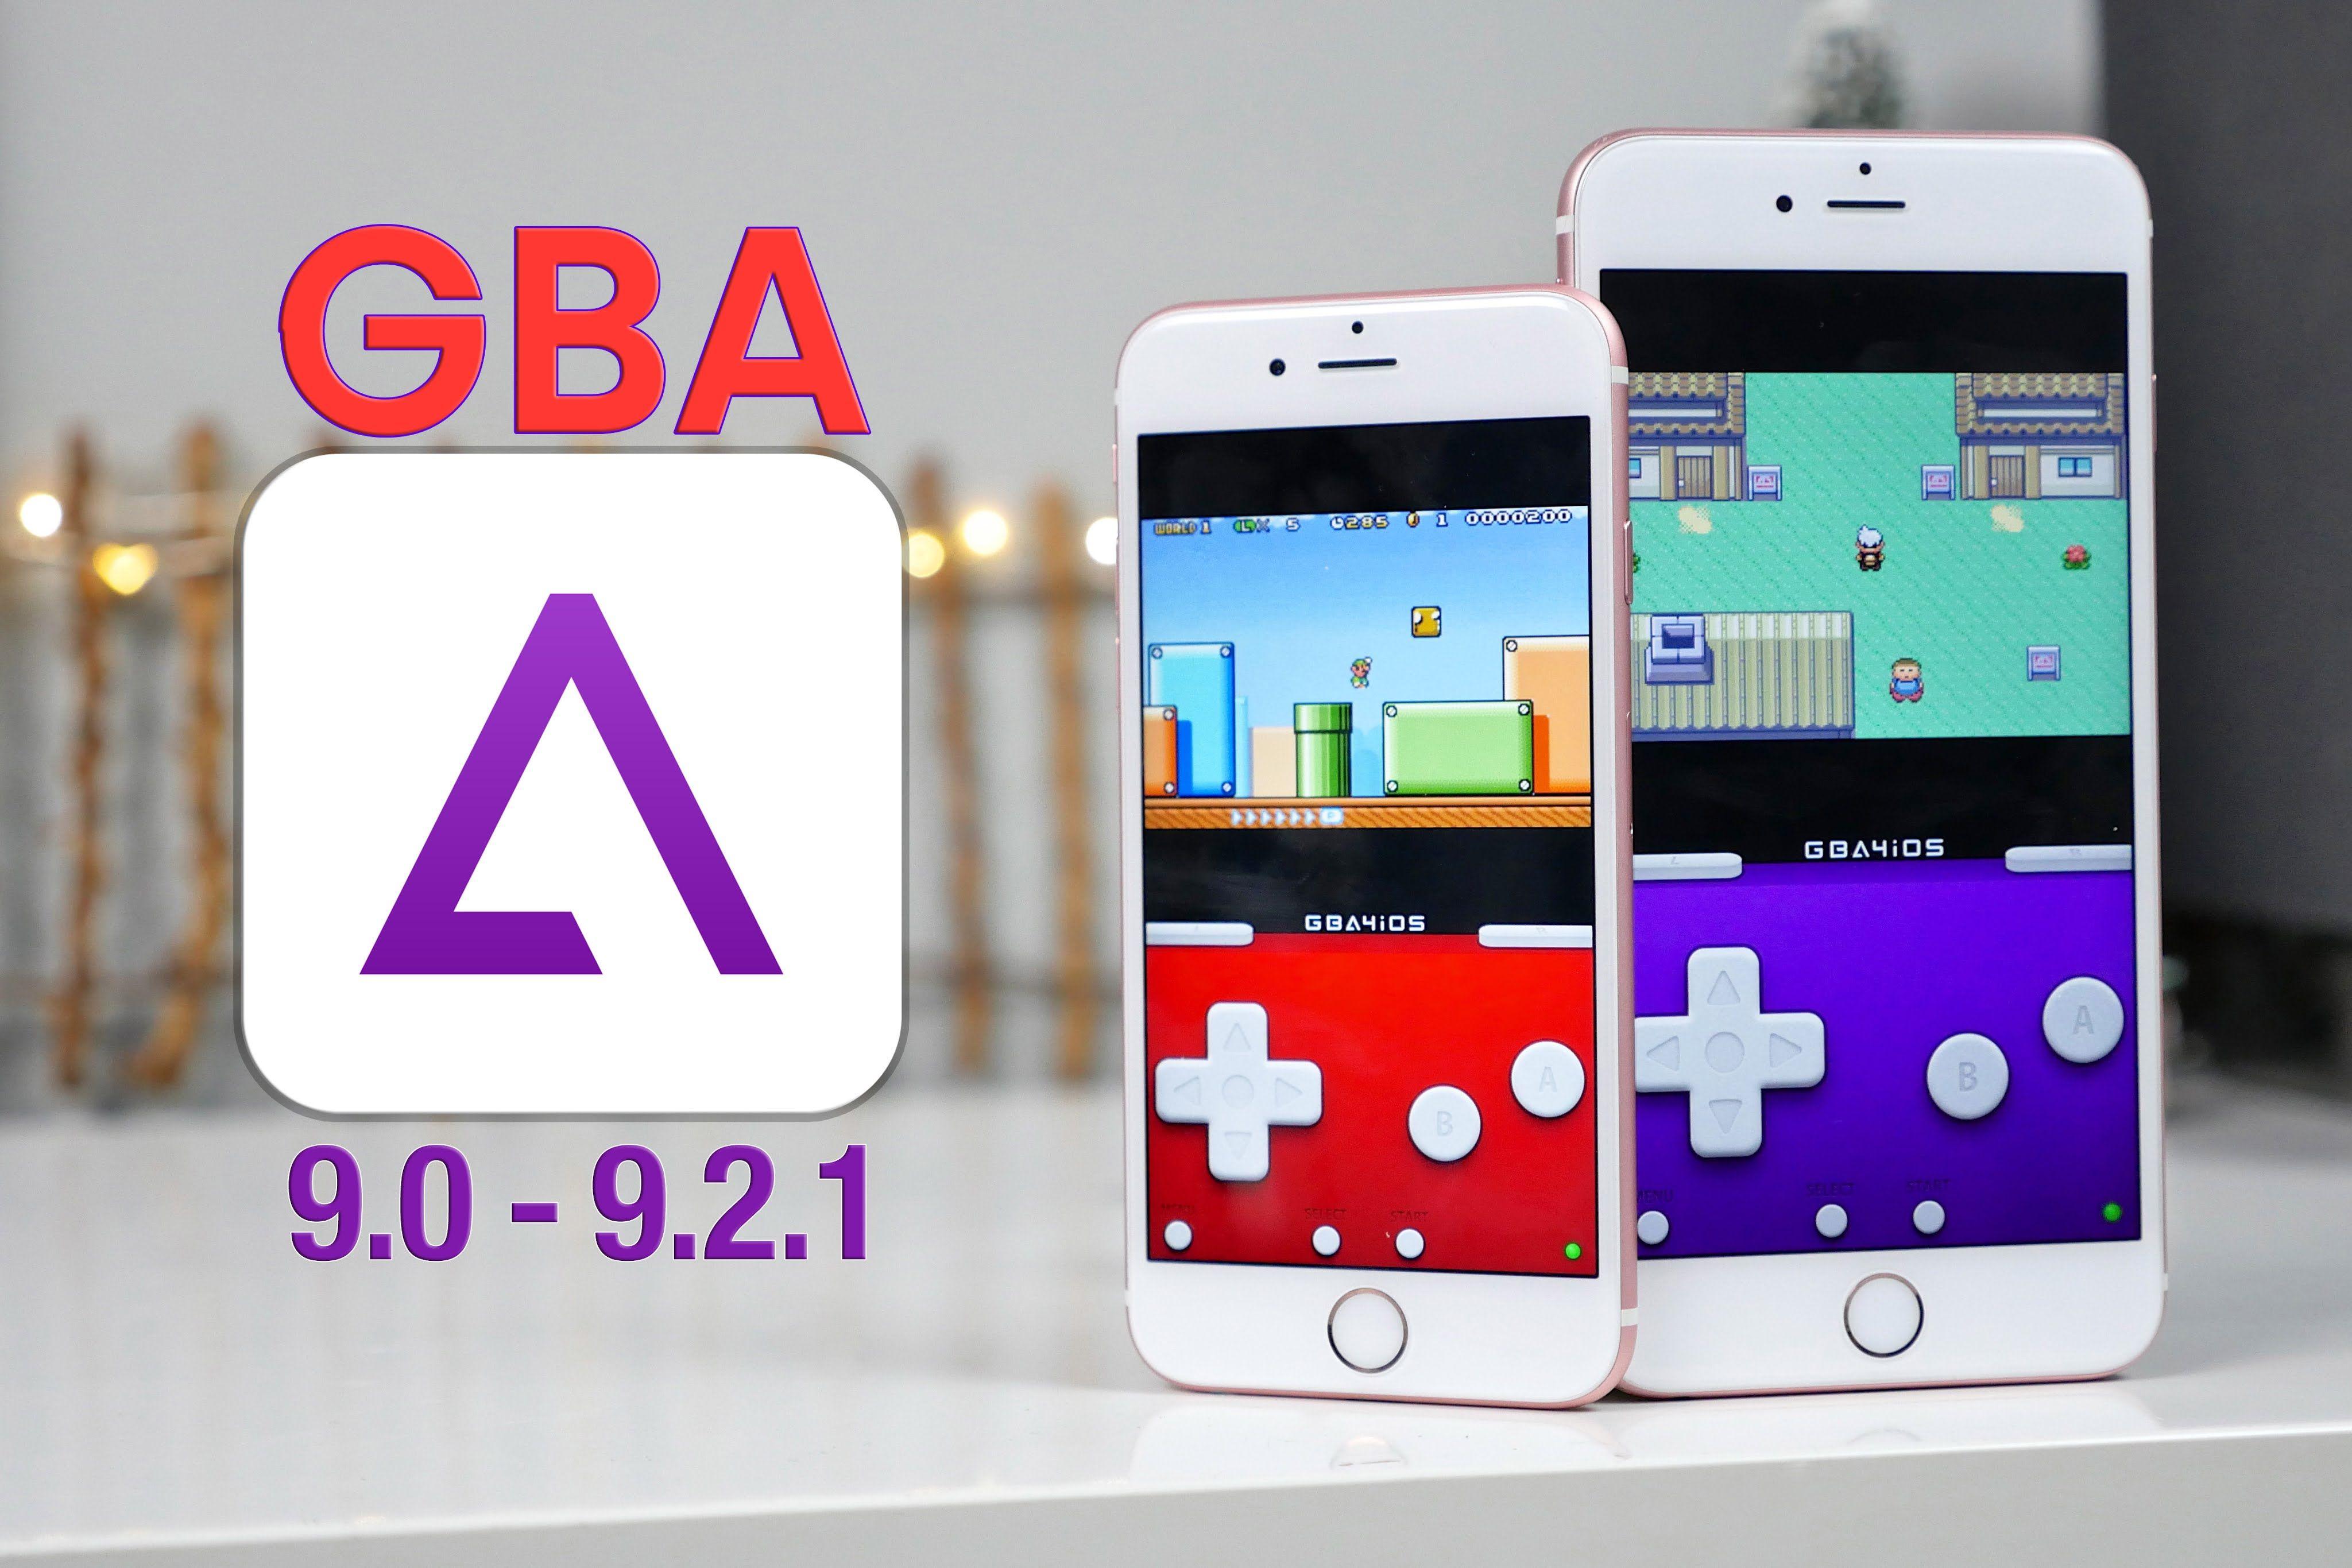 How To Get GBA Emulator on iOS 9 2 FREE - GBA4iOS 2 1 NO